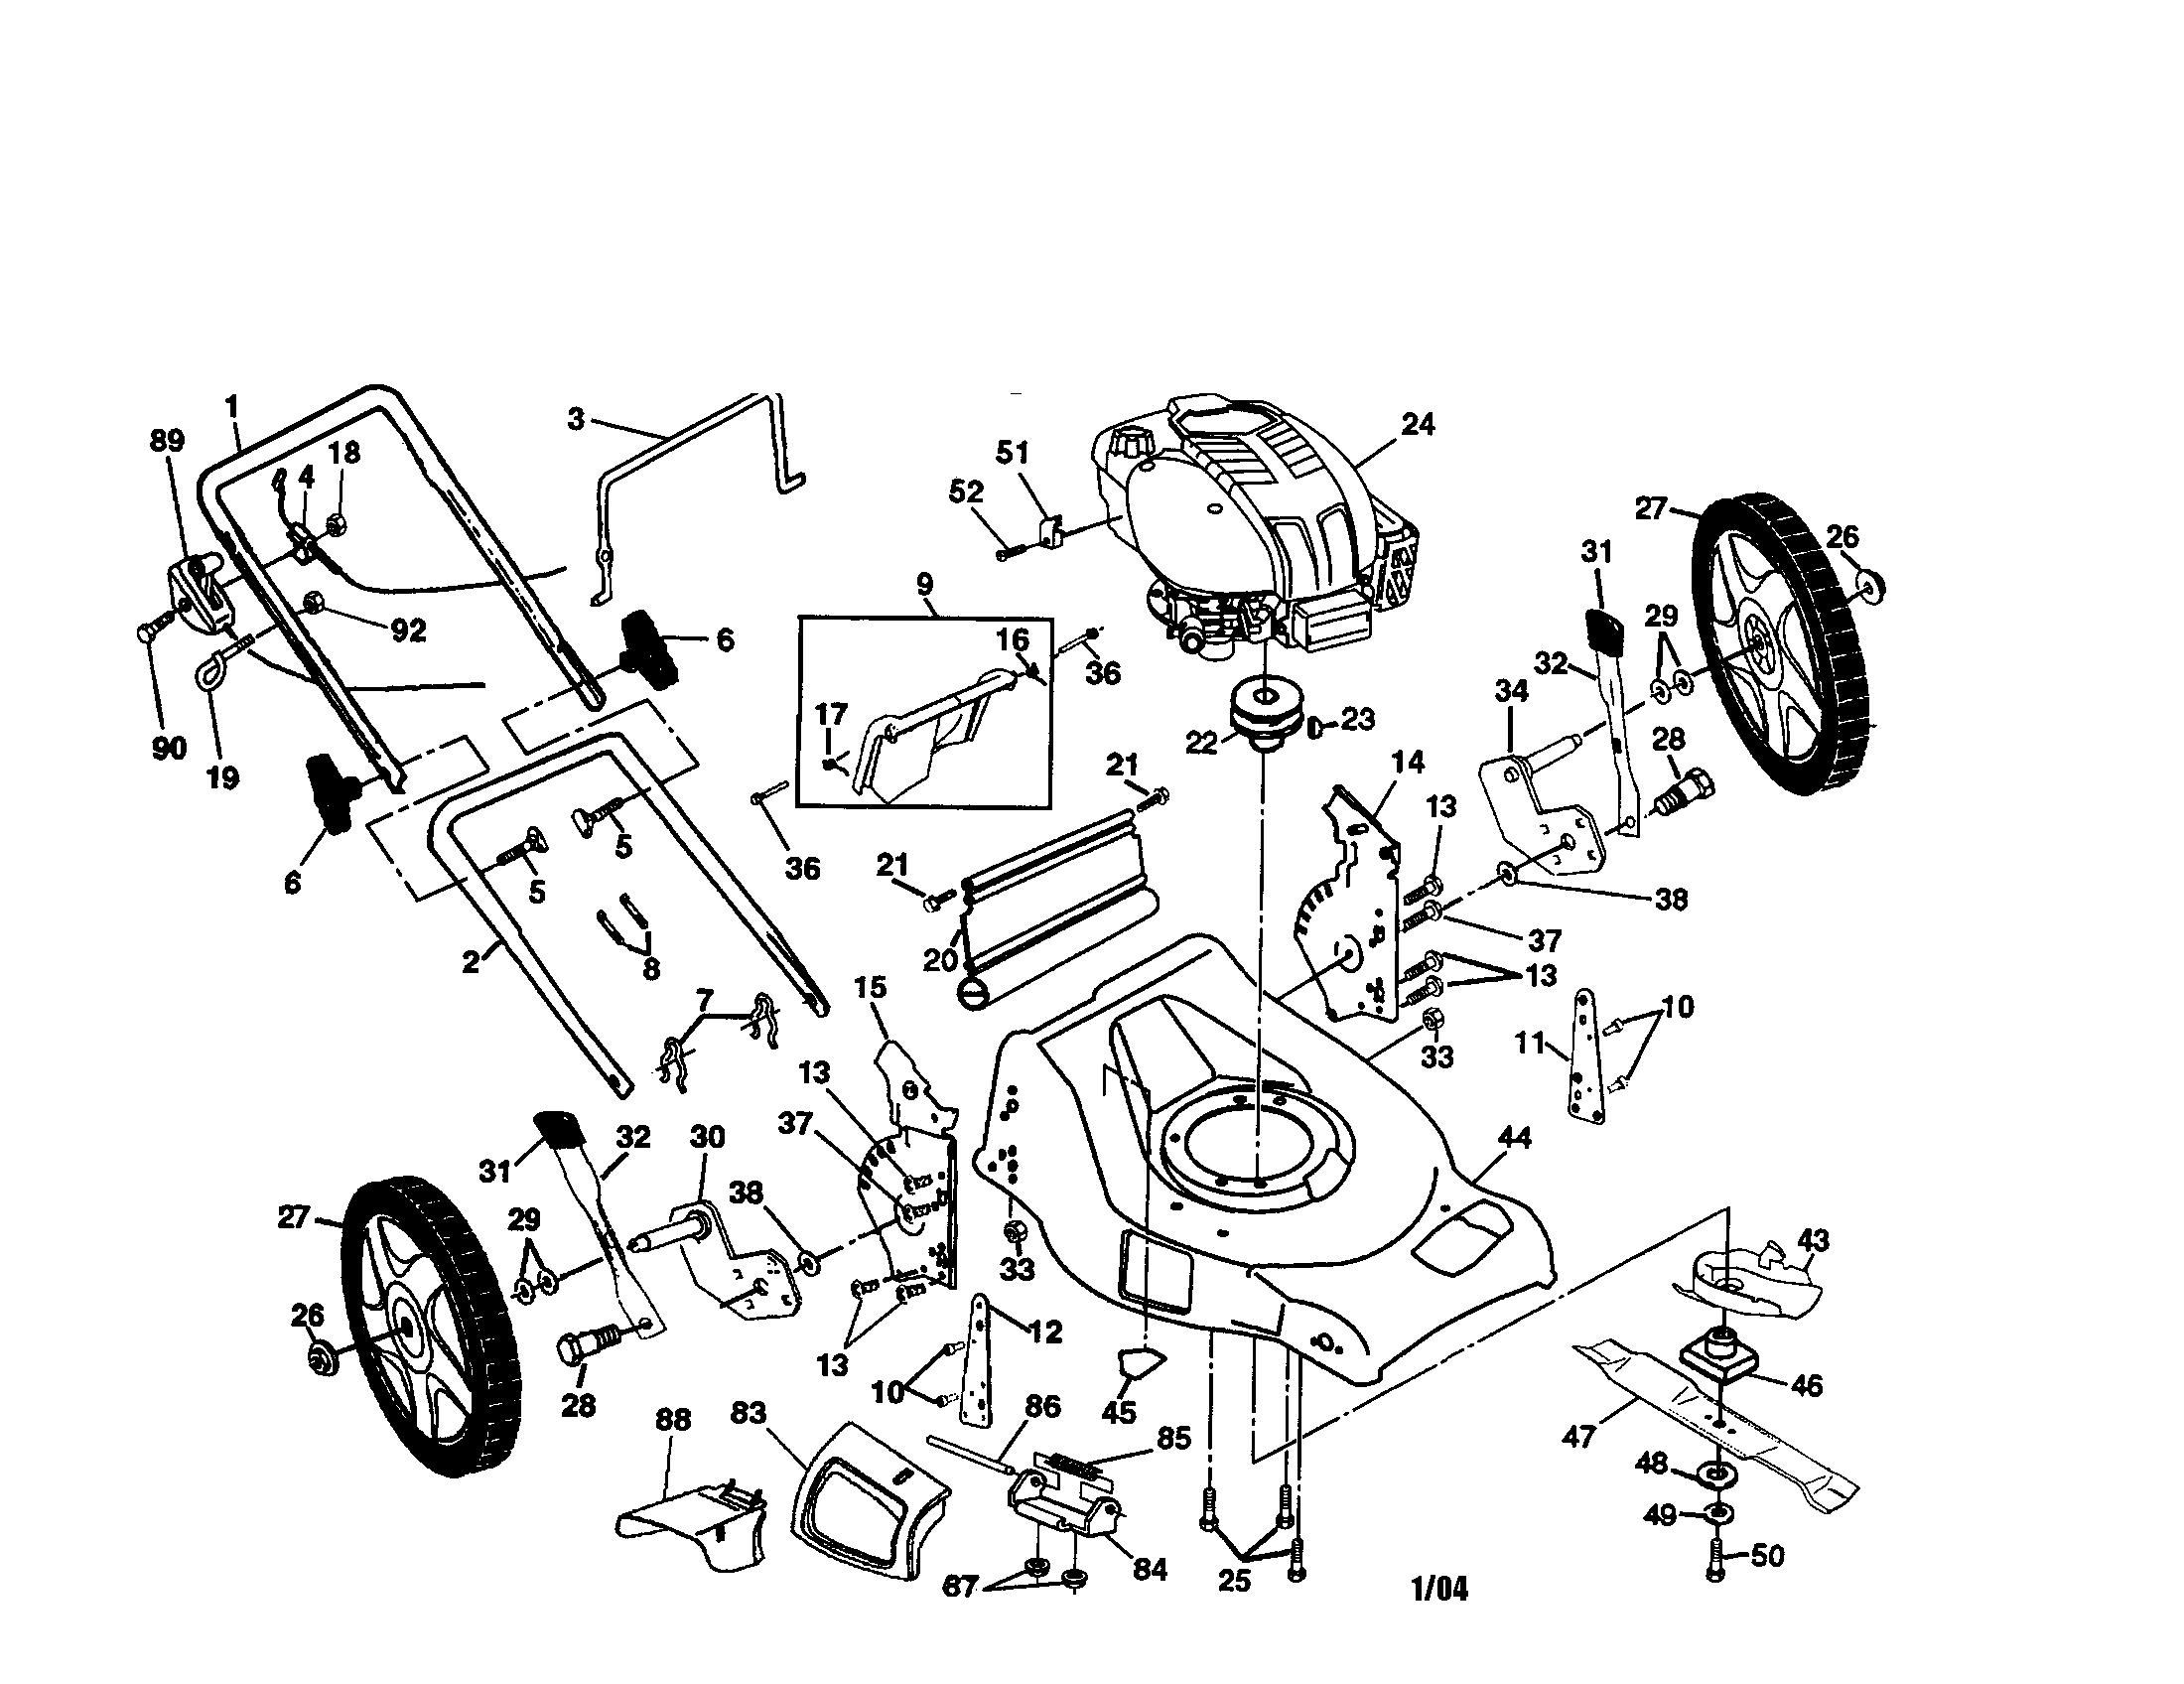 Lesco mower wiring diagram 16 riding lawn mower wiring craftsman tractor wiring diagram murray riding